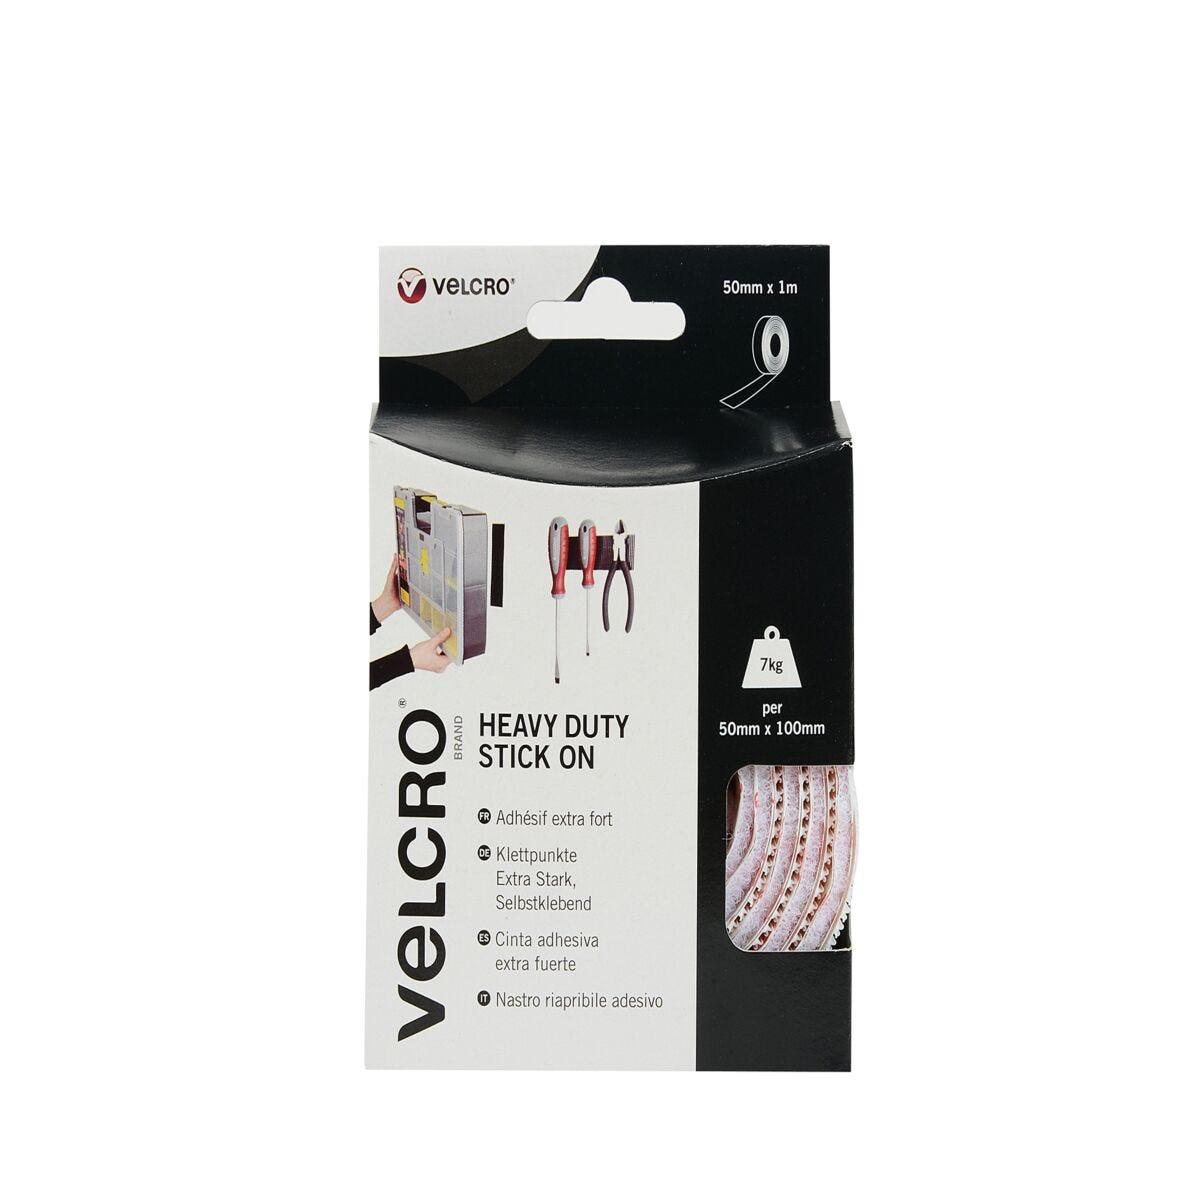 VELCRO Brand Heavy Duty Stick On 50mm x 1m White